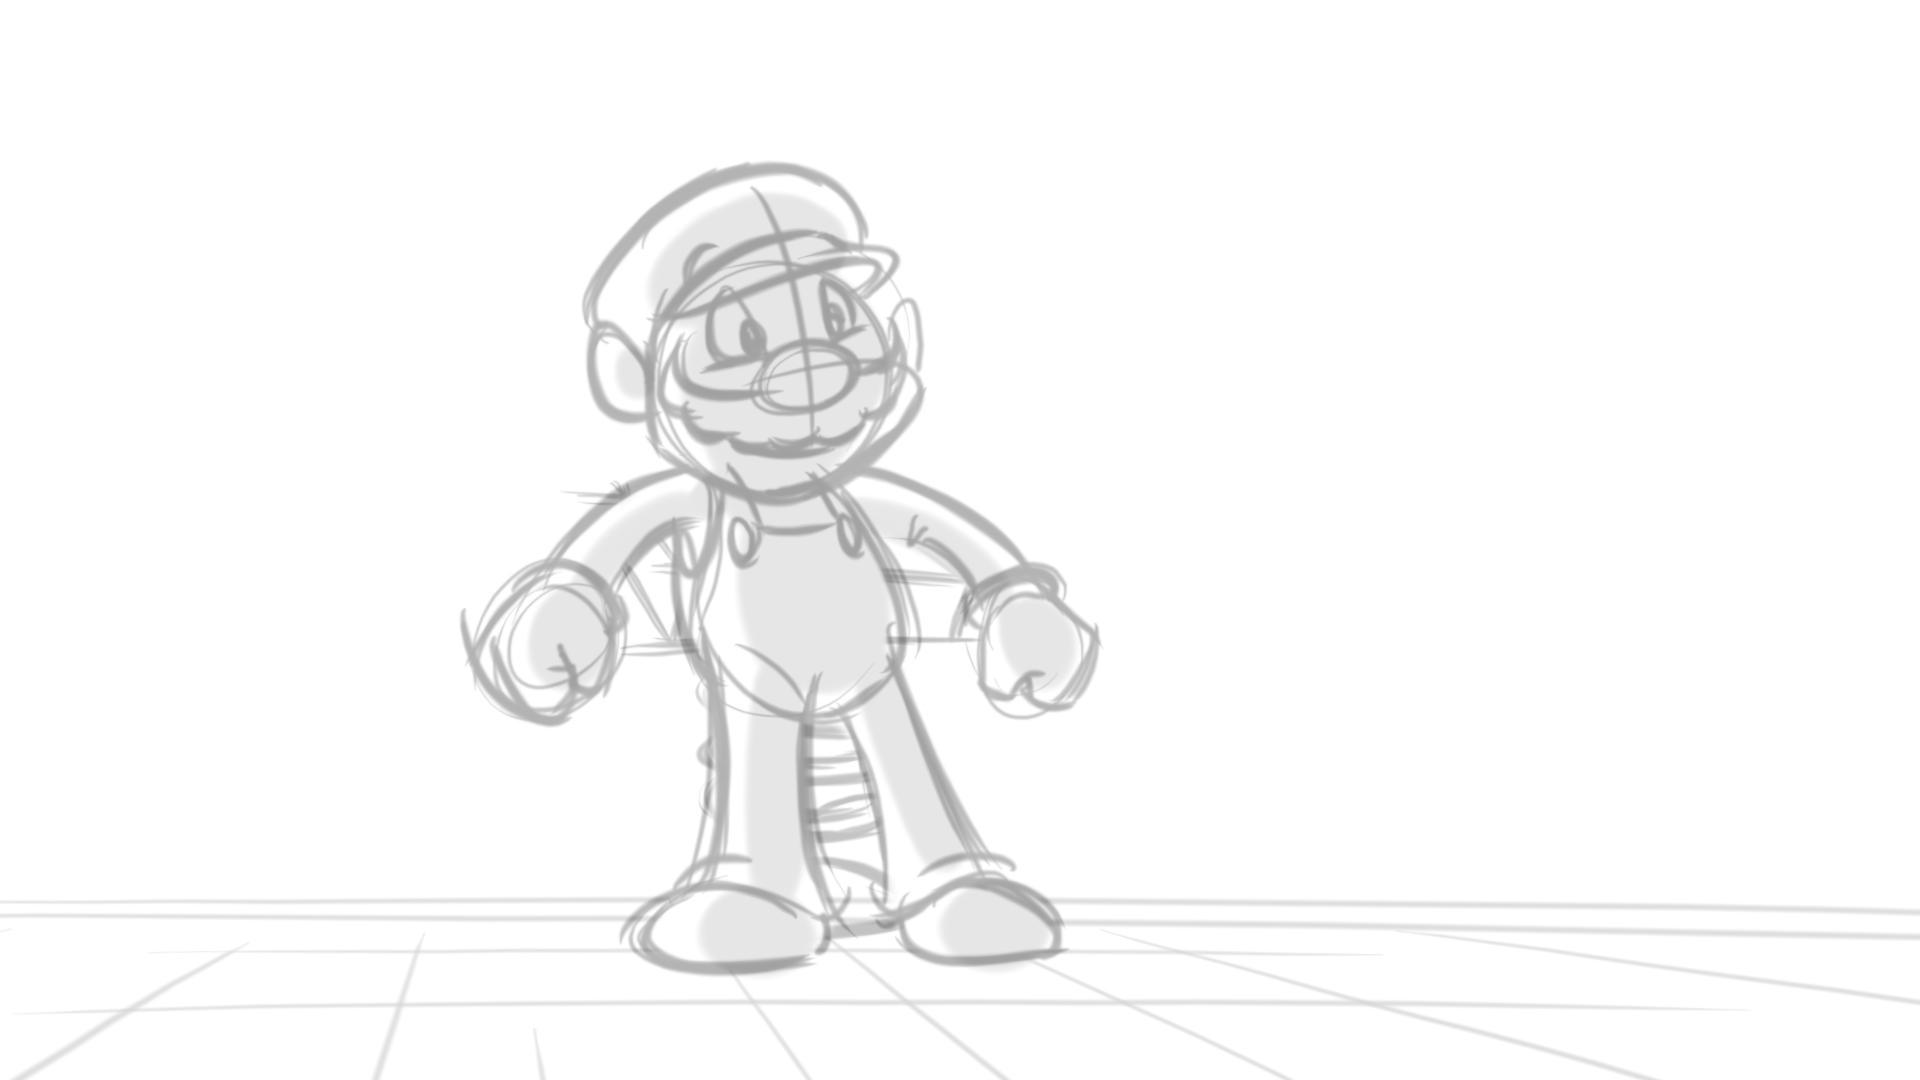 Mario-05-09.jpg